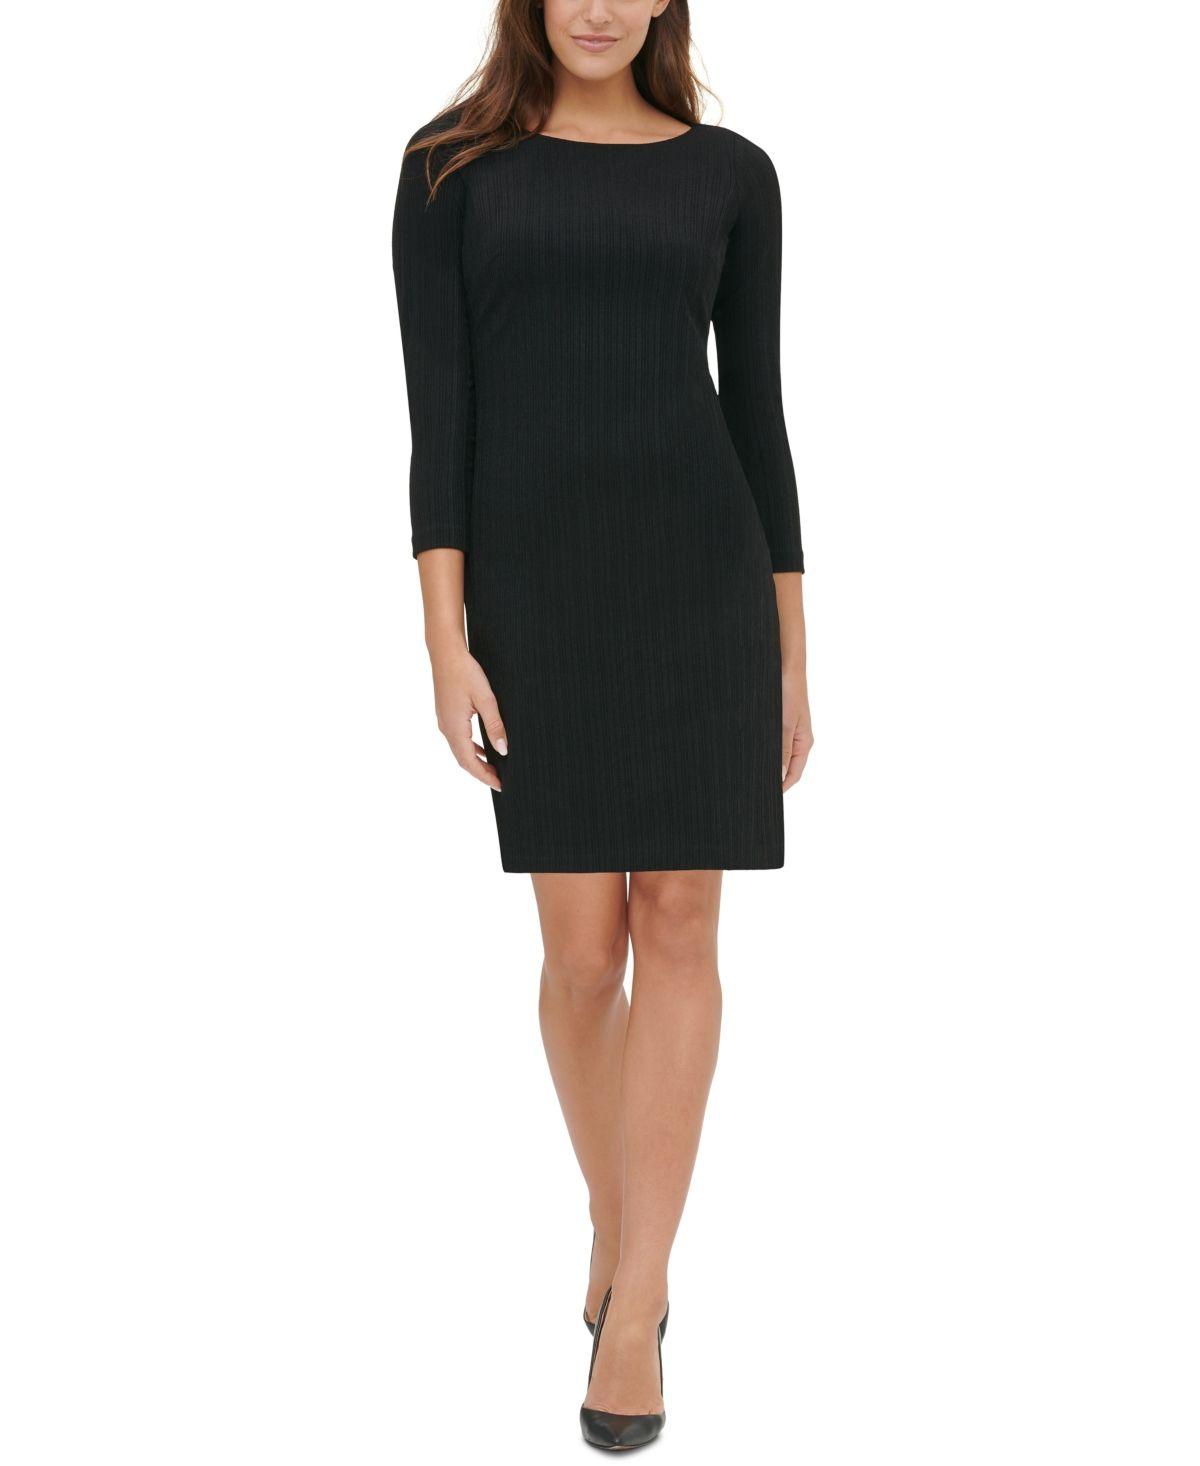 Tommy Hilfiger Tonal Stripe Sheath Dress Black Black Sheath Dress Sweater Dress Sheath Dress [ 1466 x 1200 Pixel ]